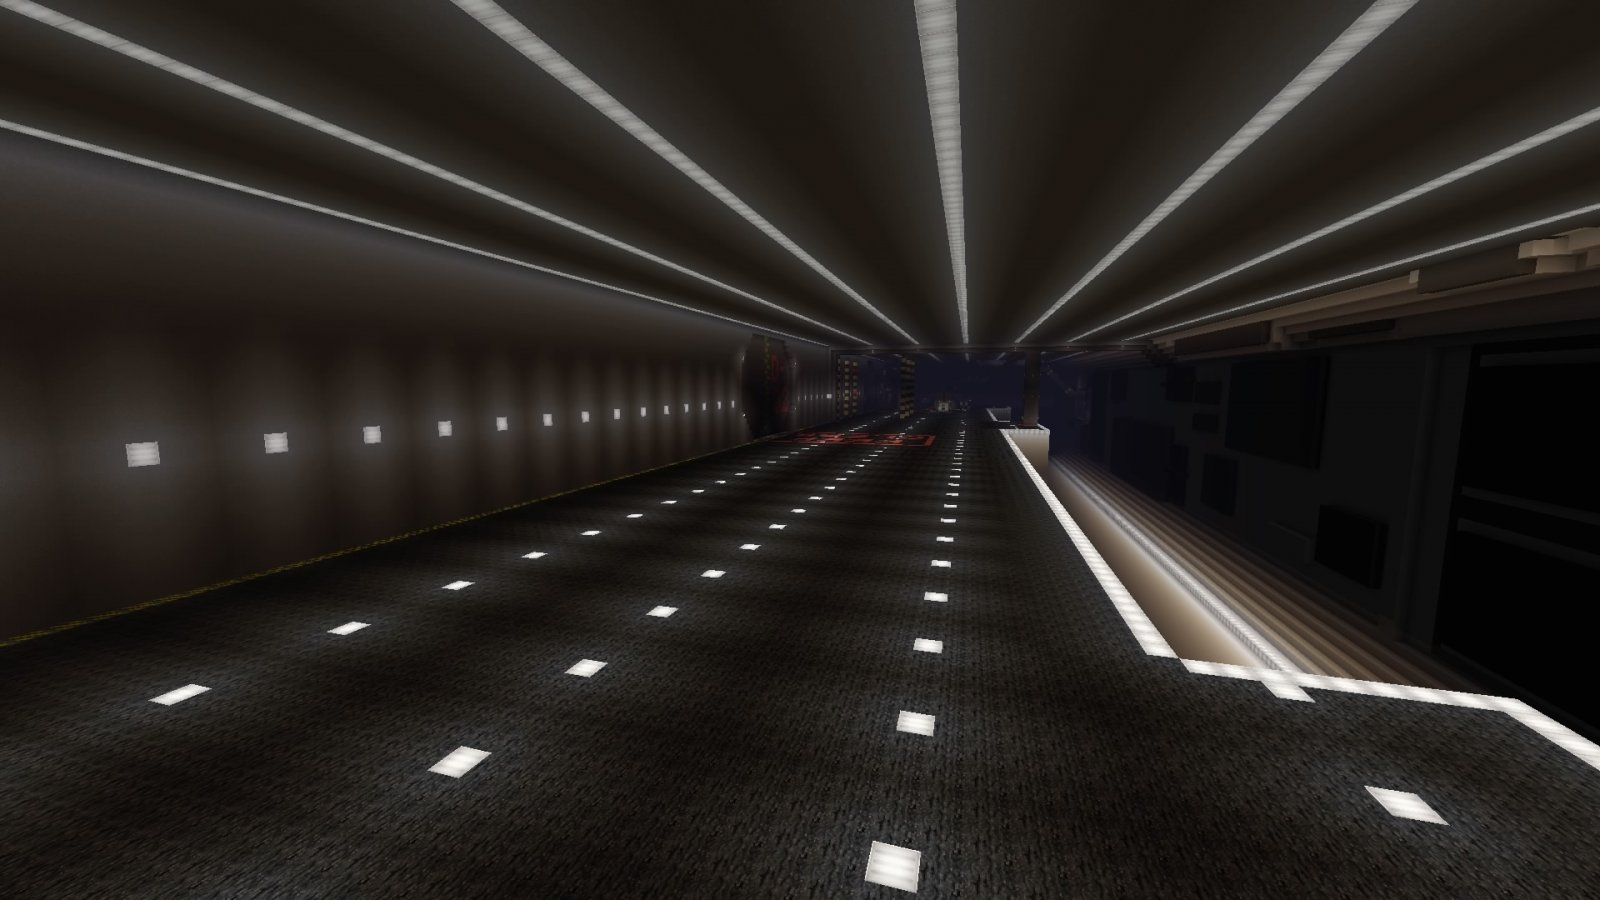 Interior of the ARMD-1